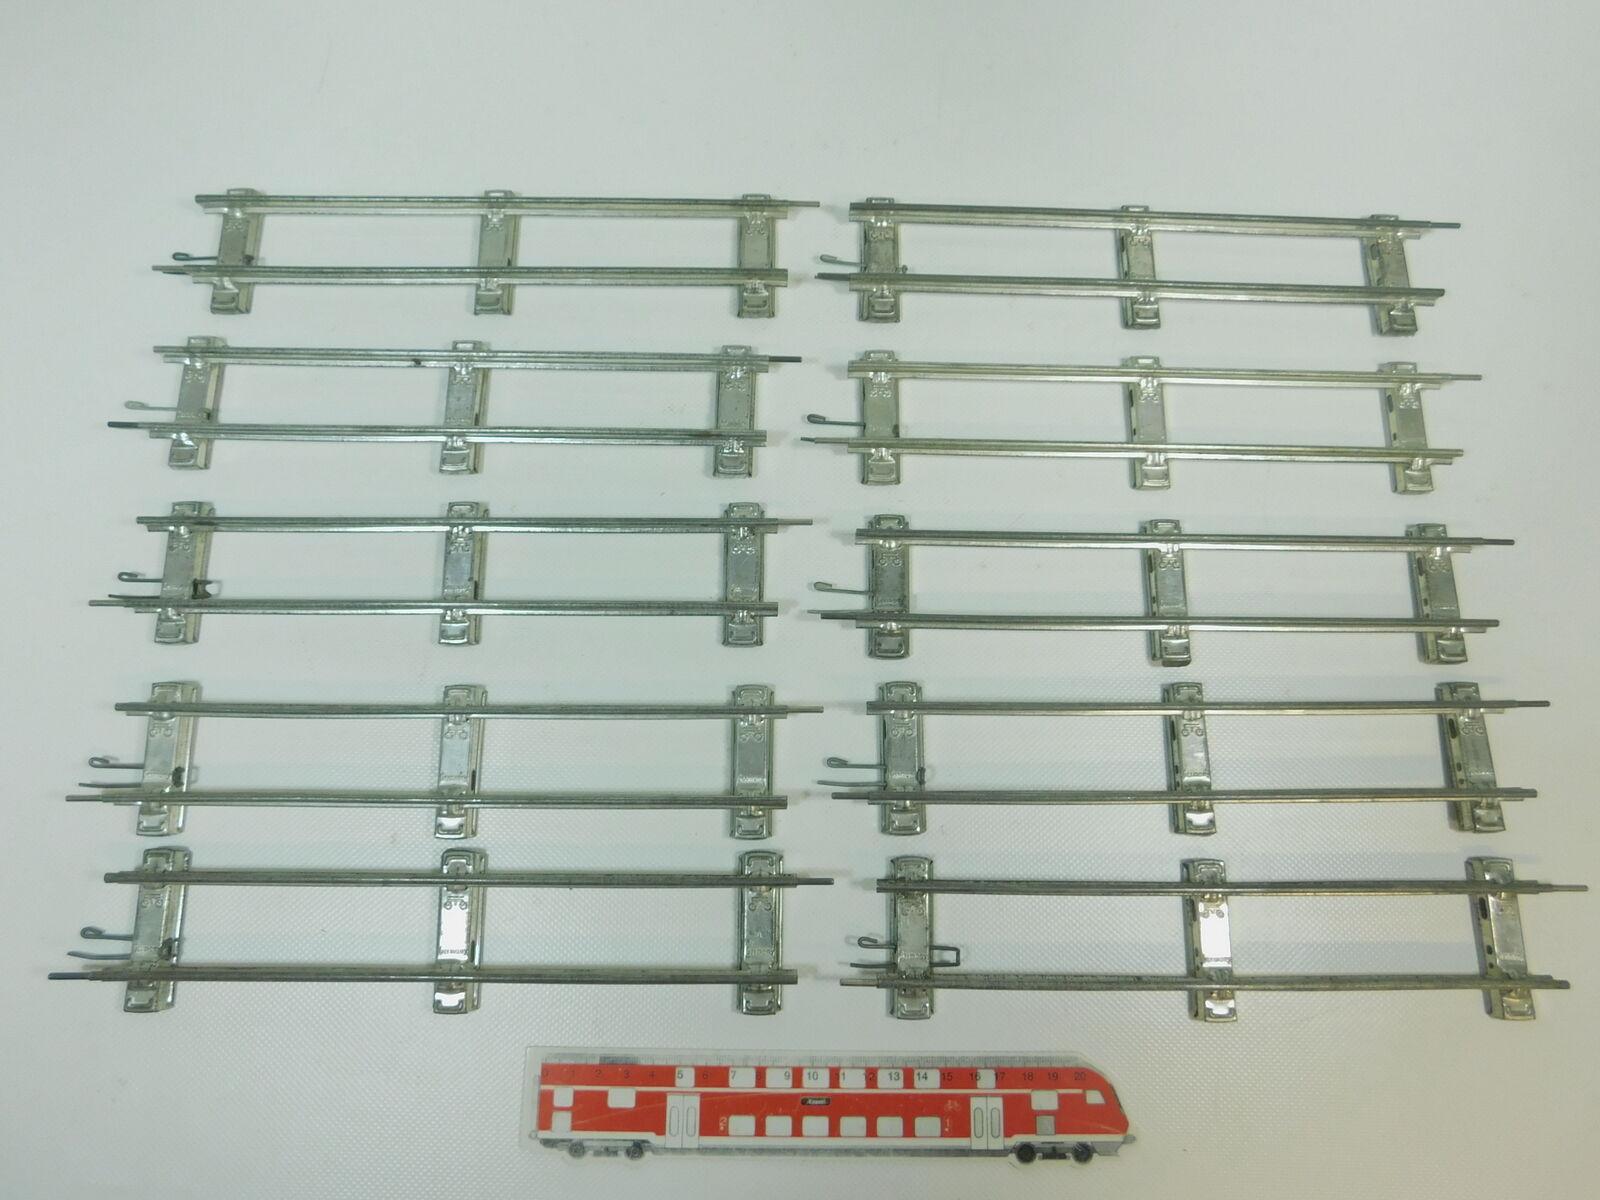 BK317-1  10x Märklin Spur 0 Gleis Gleisstück gerade (26 cm) für Uhrwerk-Betrieb